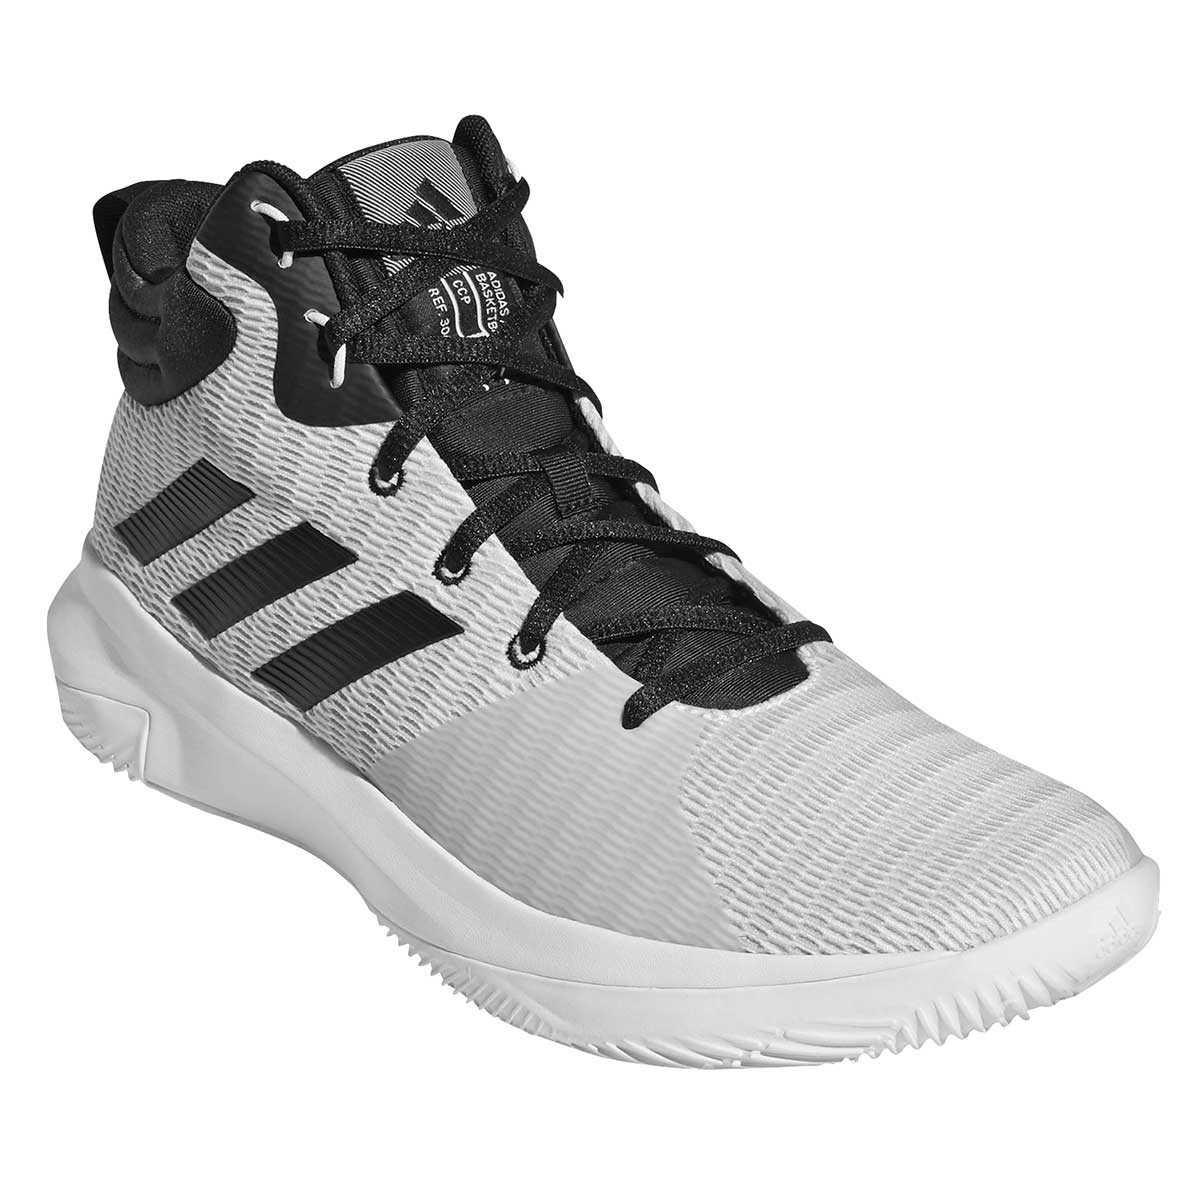 6daf503c Tenis De Bota Para Hombre adidas Originales Ap9833 Dgt - $ 2,514.00 ...